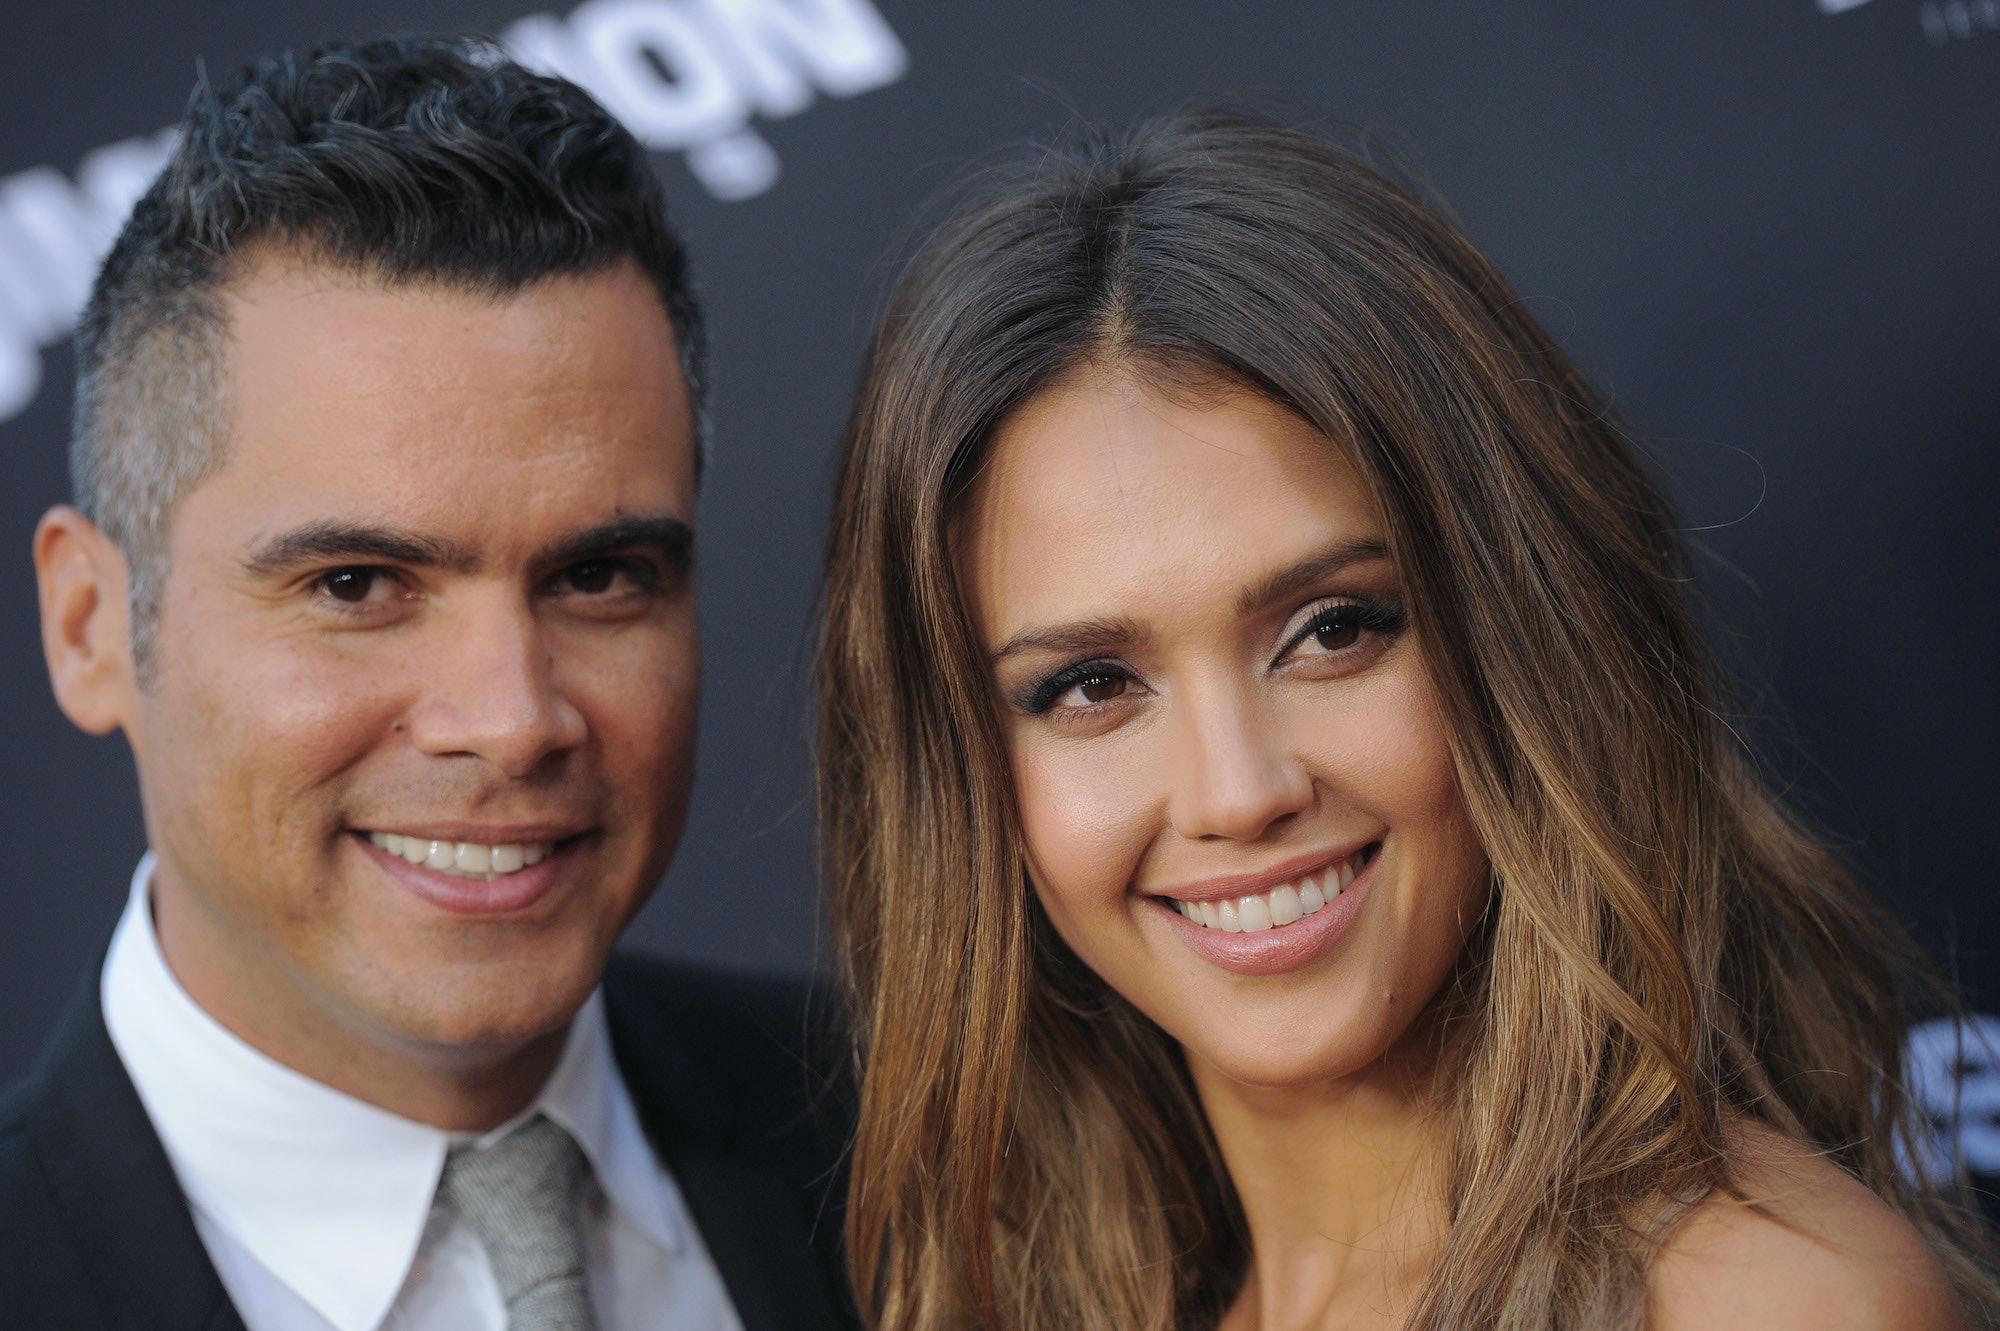 Similarity facial features couples